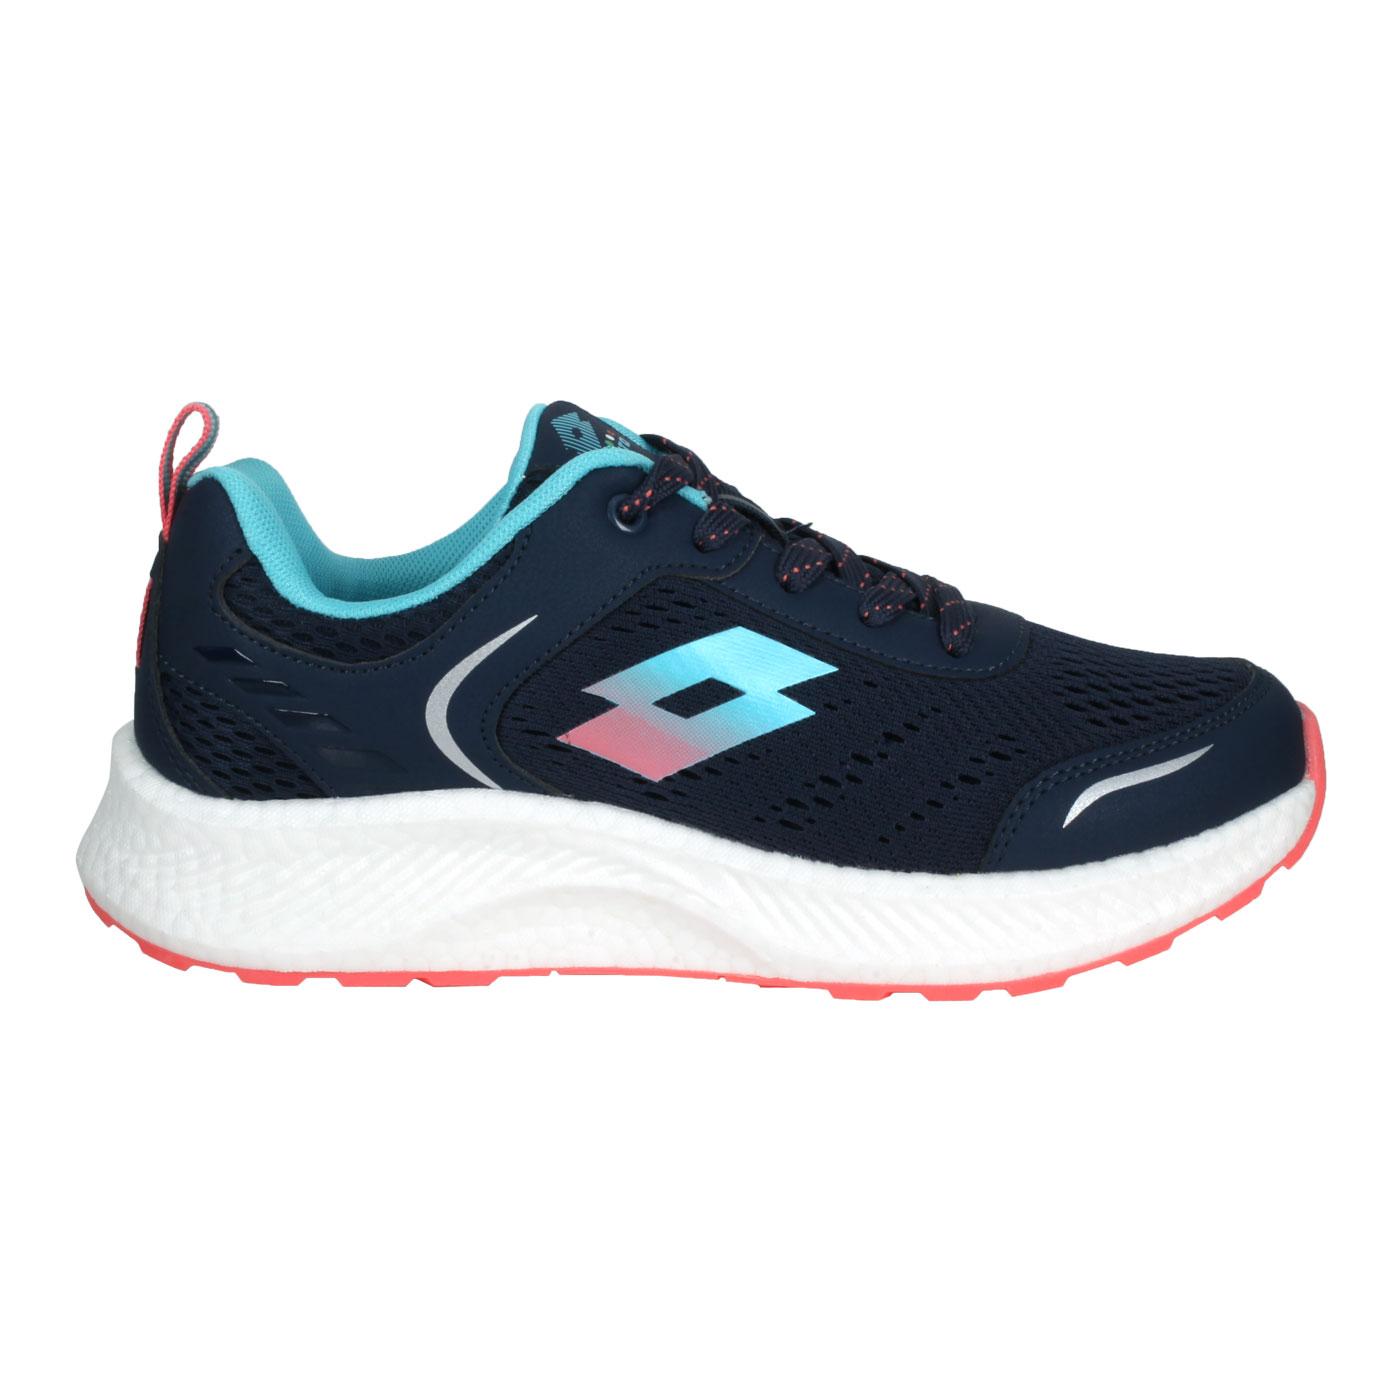 LOTTO 女款創跑鞋 LT1AWR3826 - 丈青藍